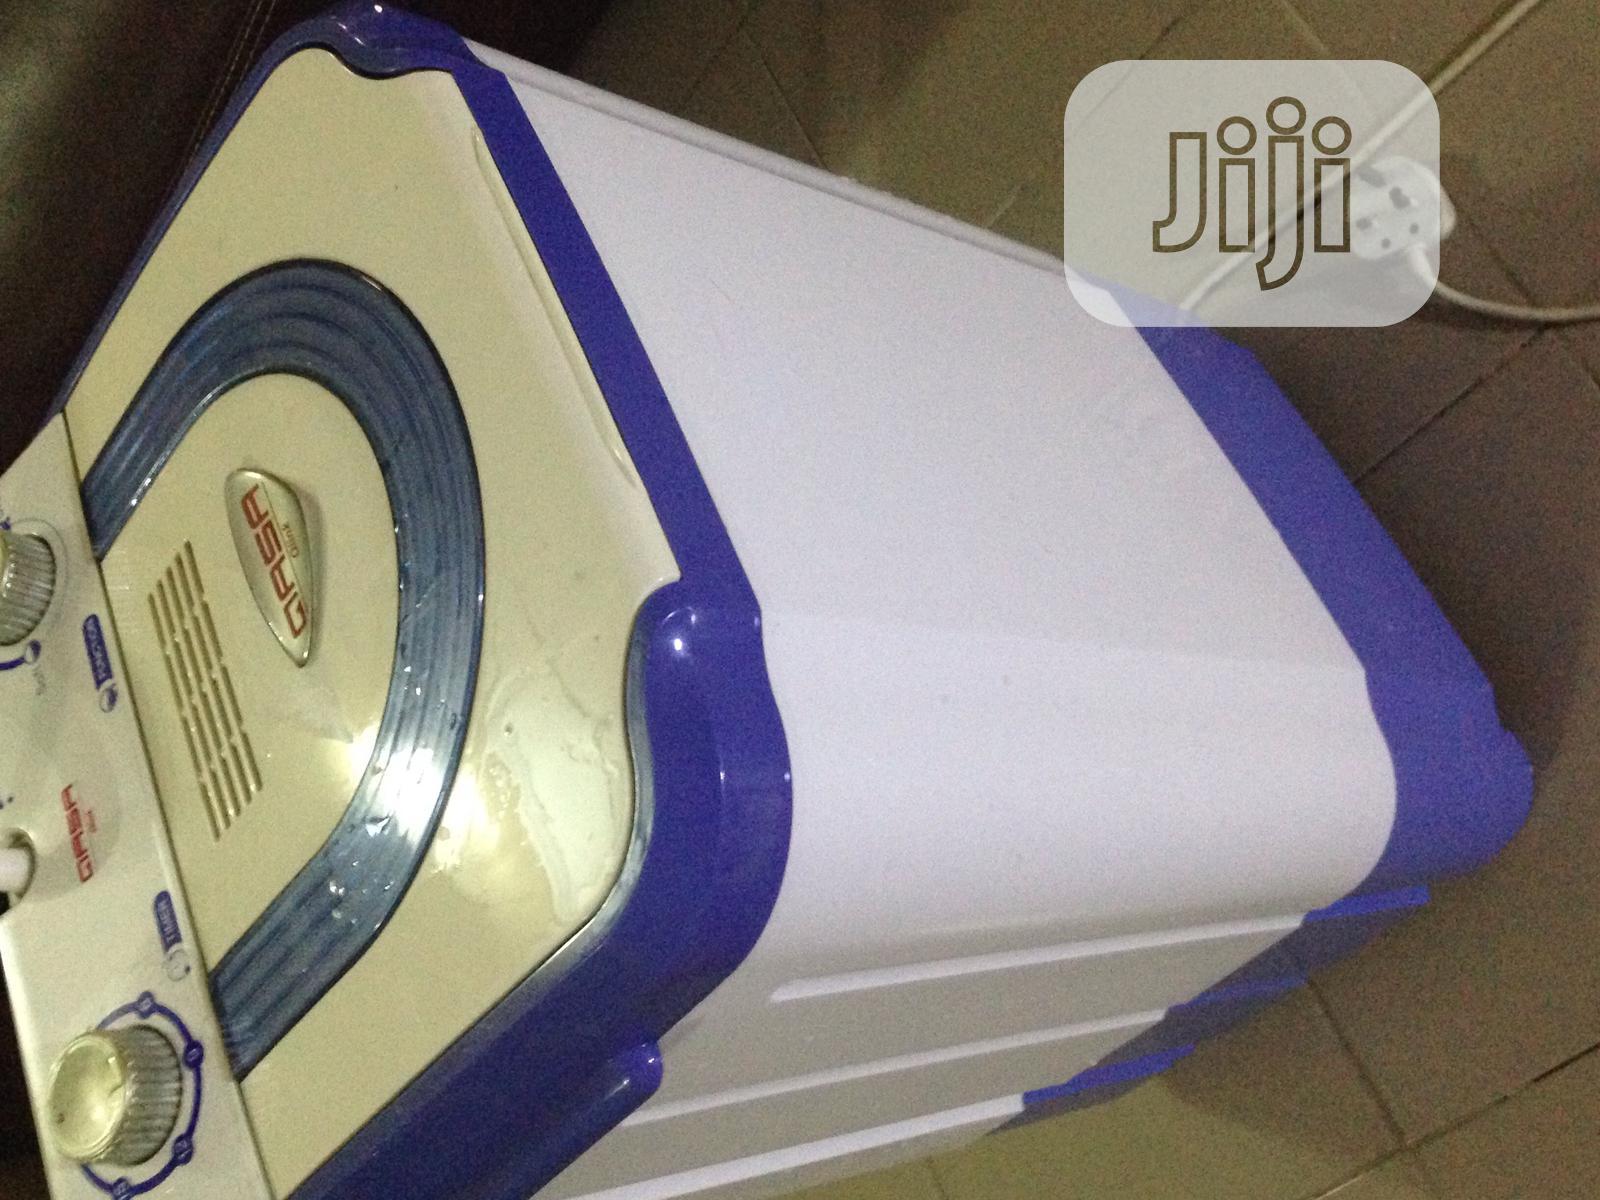 Qasa 3kg Washing Machine   Home Appliances for sale in Ajah, Lagos State, Nigeria